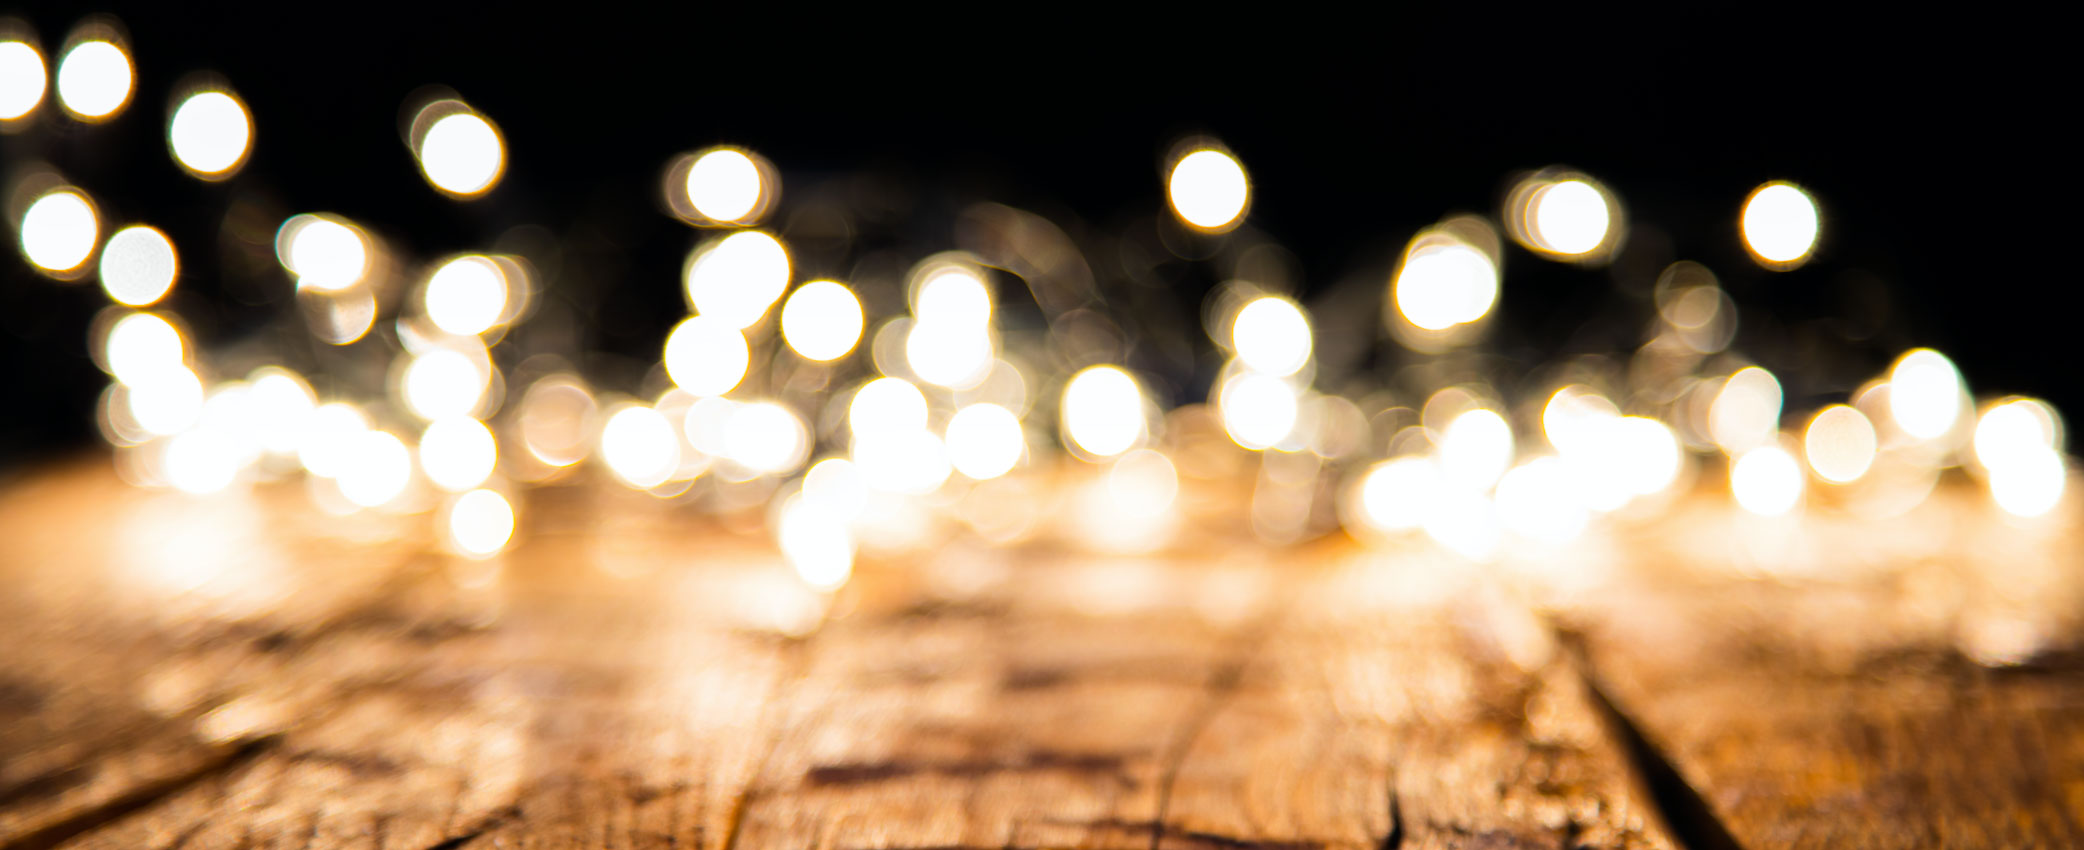 Christmas_Light_Blur_Wood